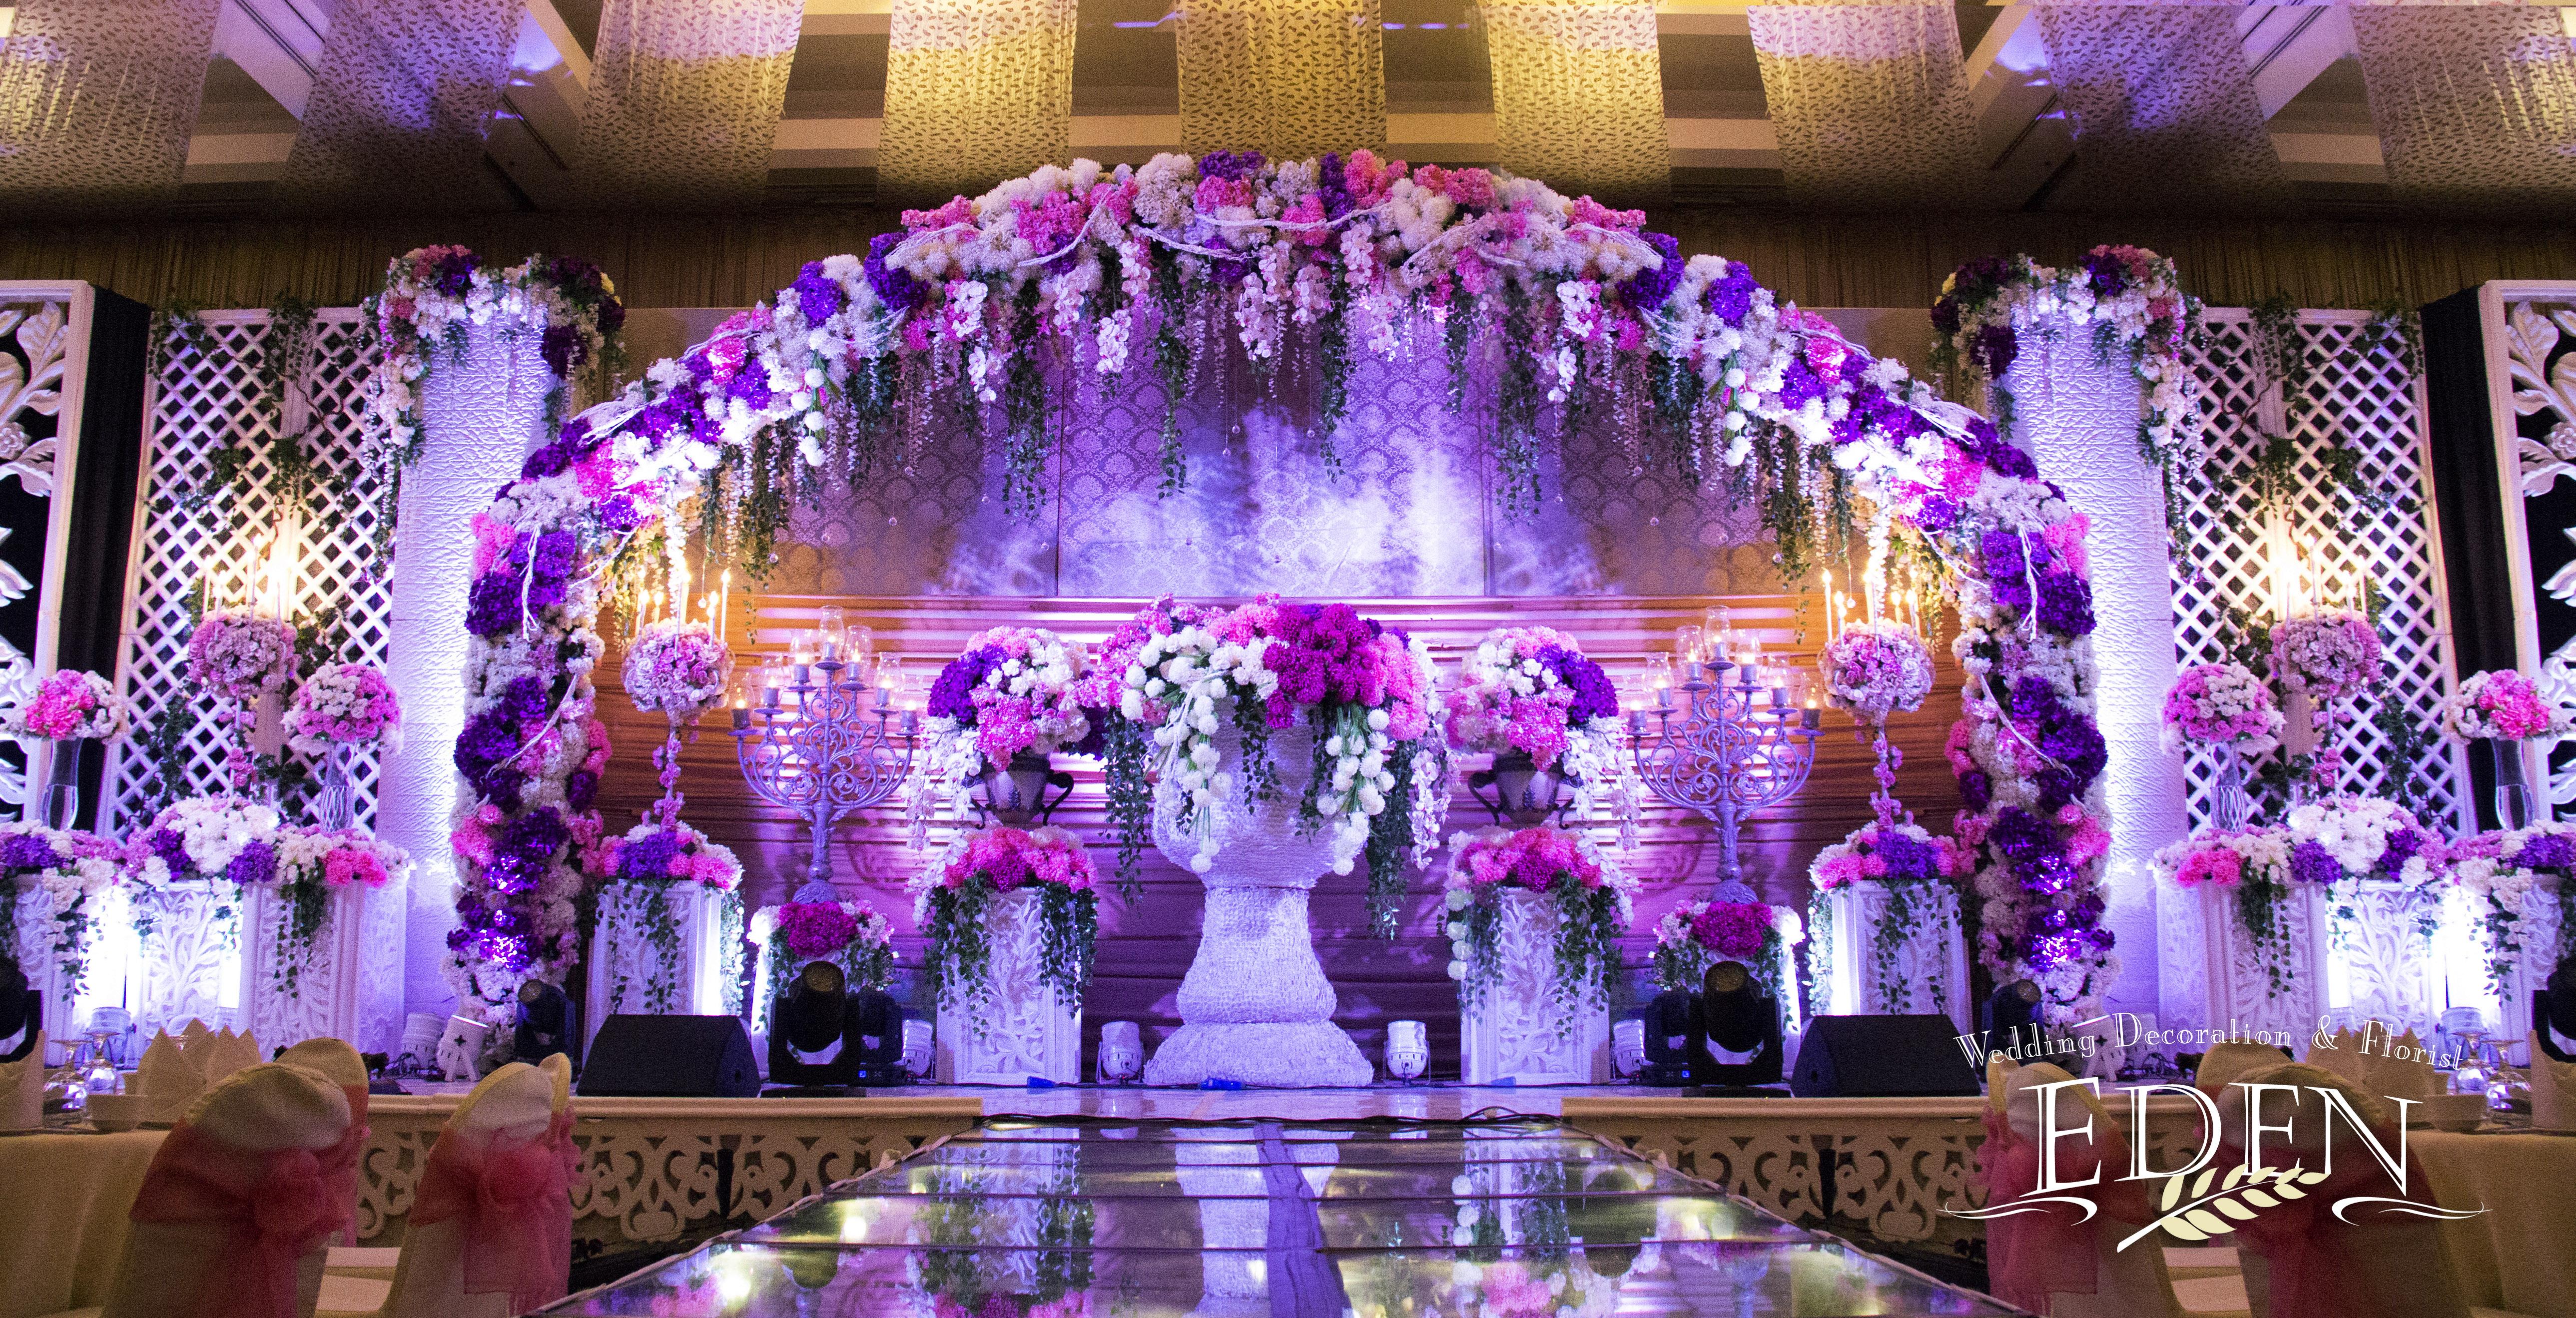 85 wedding decoration jakarta100 golden wedding decoration jakarta 100 wedding decoration jakarta murah photo dekorasi 7 weddi junglespirit Gallery